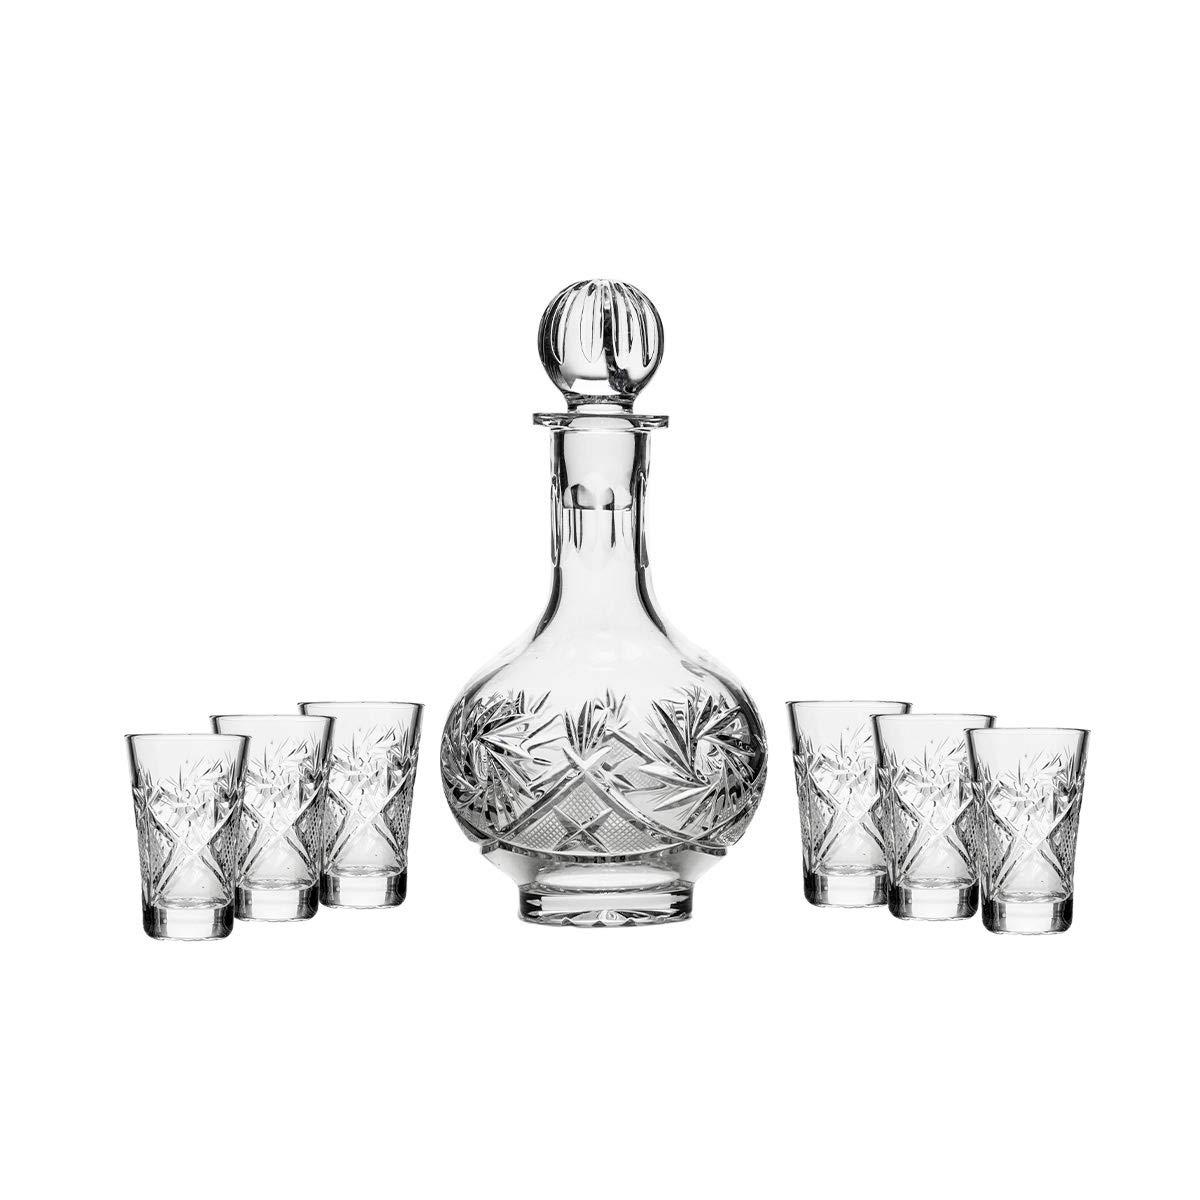 Vodka Set Russian Cut Crystal 12 Oz Carafe Decanter & 6 Crystal Shot Glasses 35 Ml 1.2 Oz